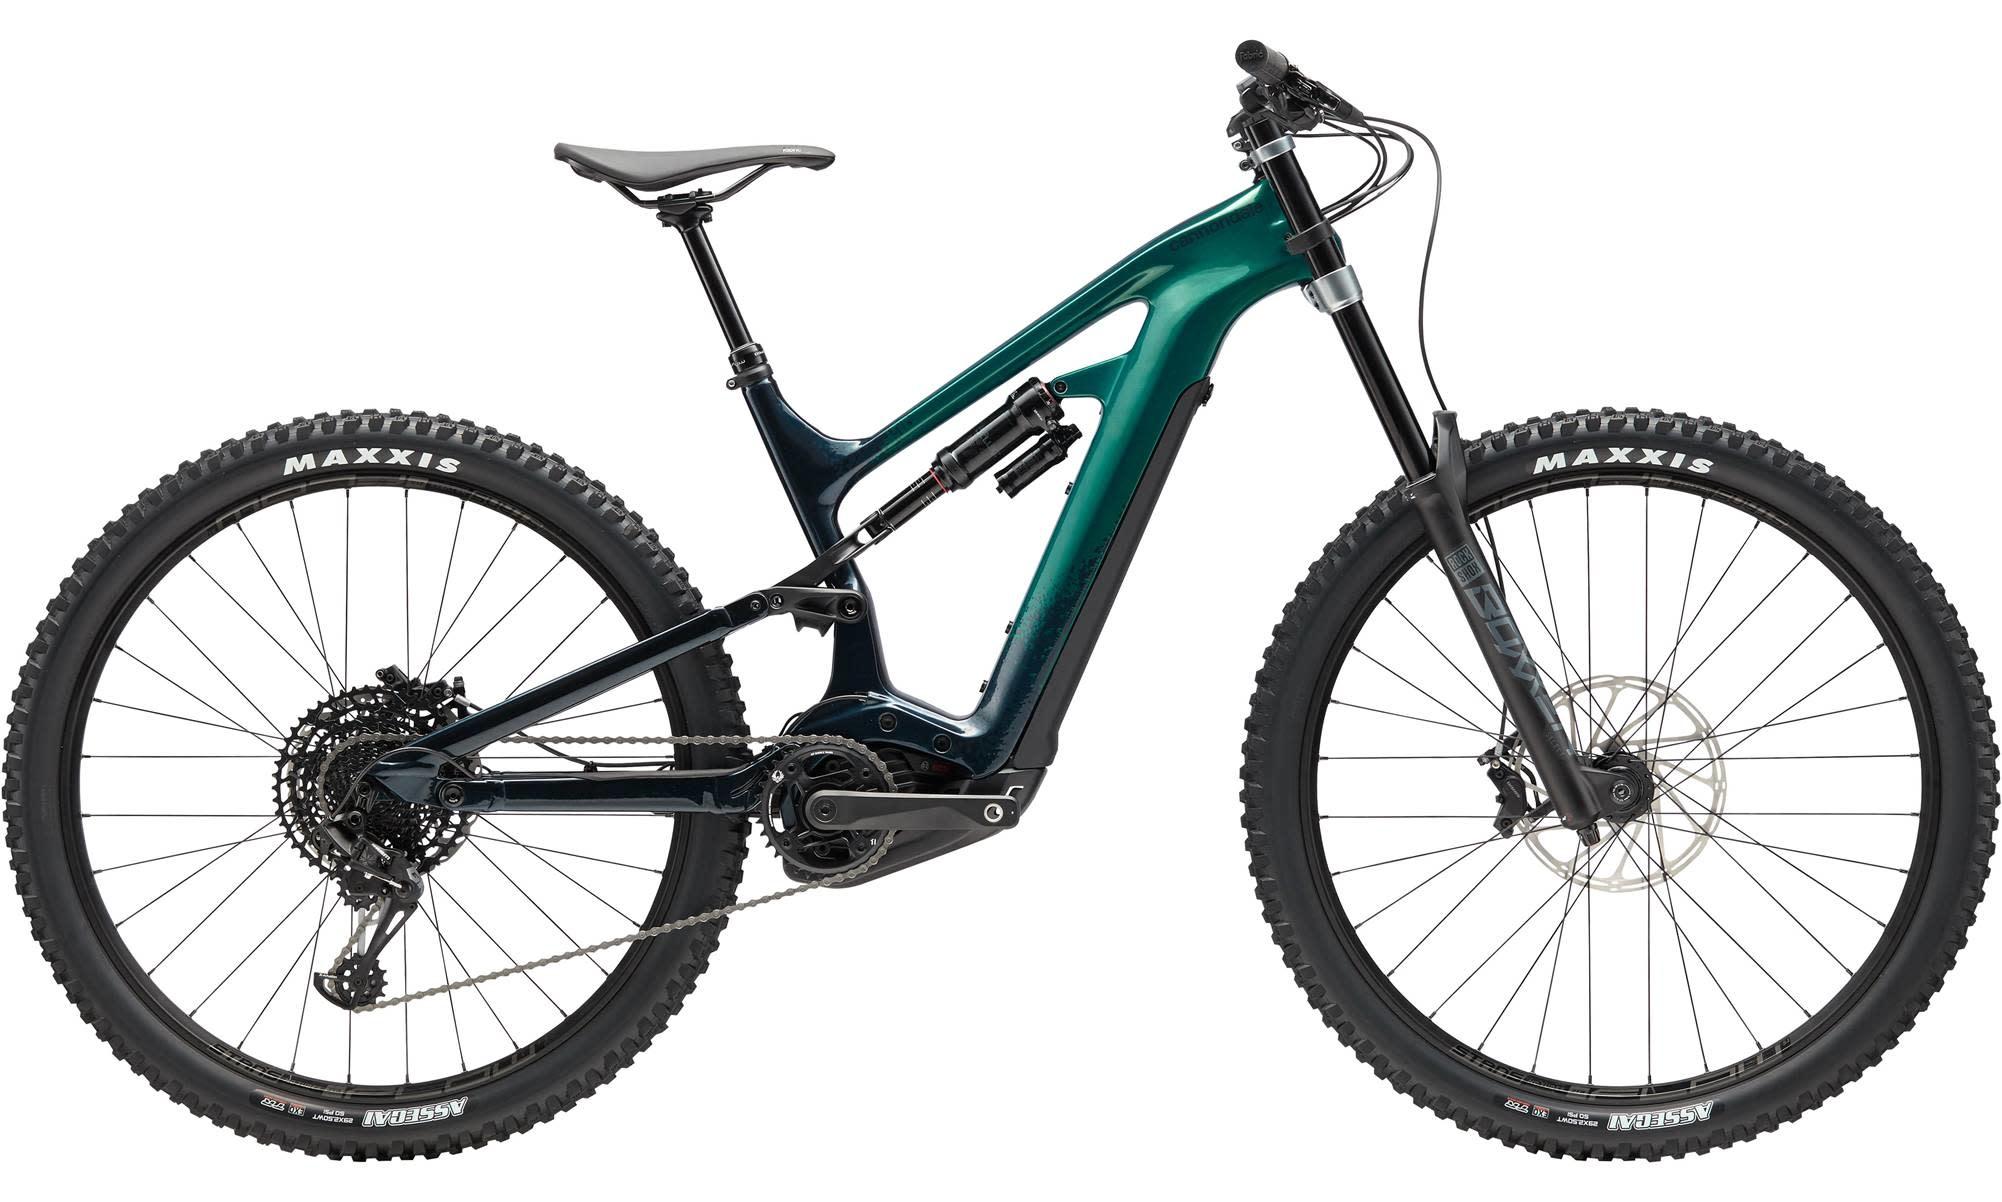 Cannondale Cannondale Moterra Neo SE 27.5 Electric Mountain Bike 2020